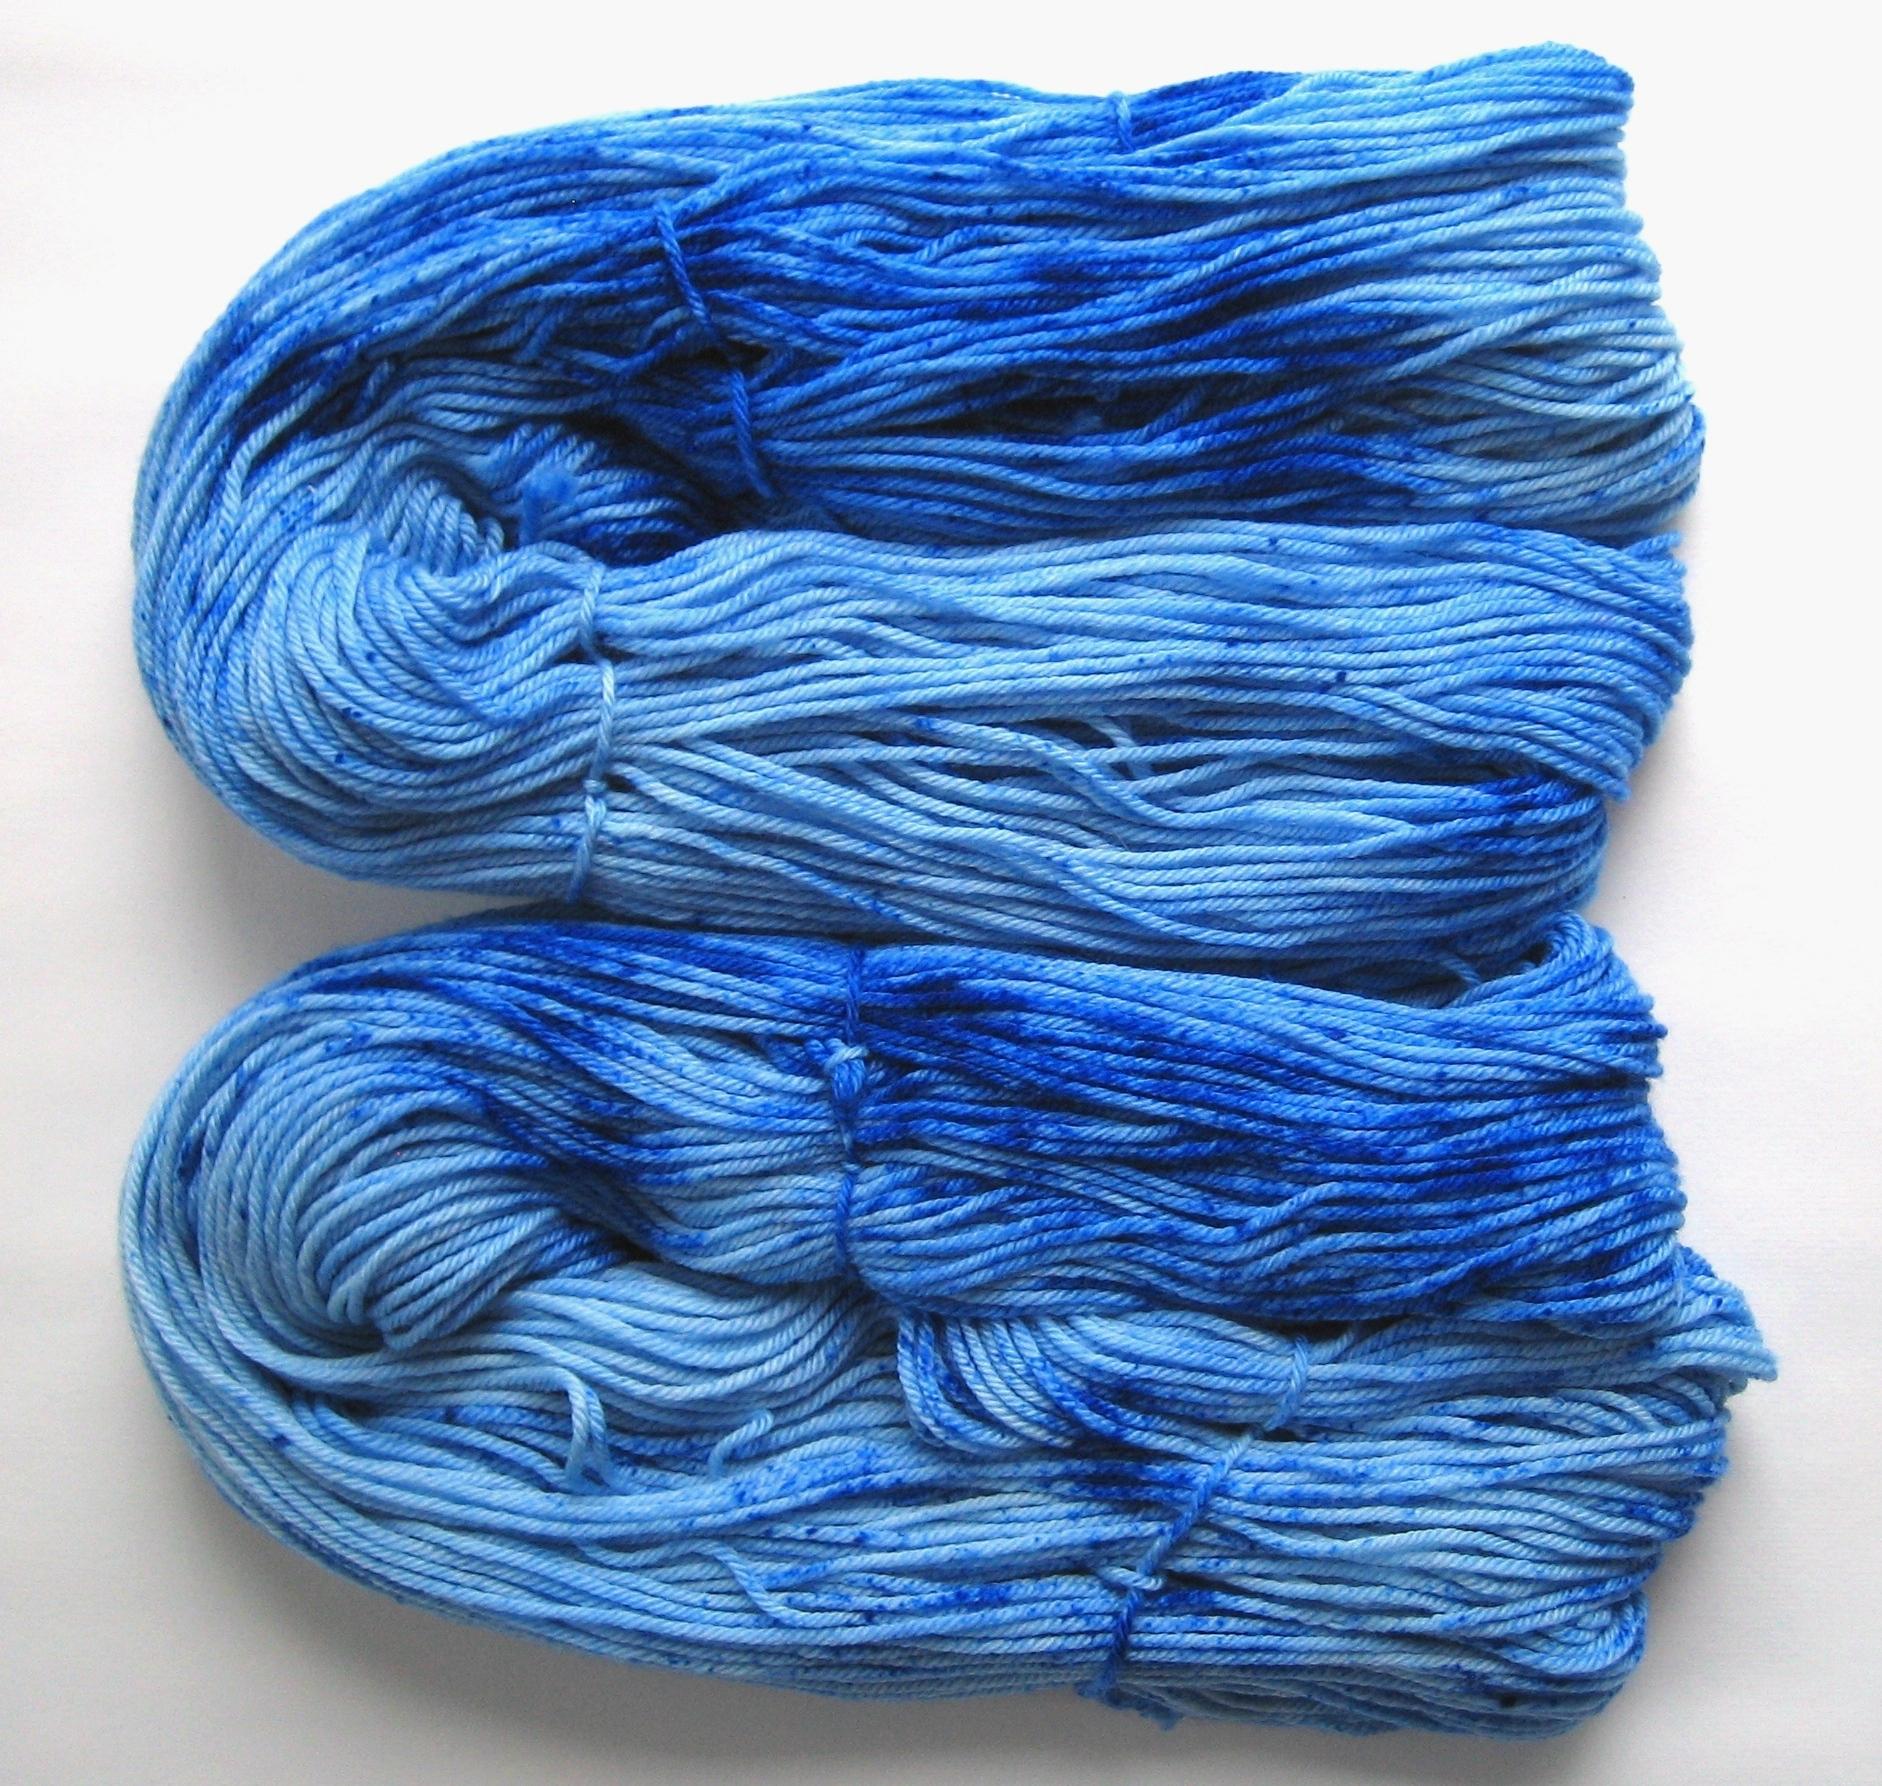 garnyarn-haandfarvet-garn-mellem-merinould-superwash-blaa